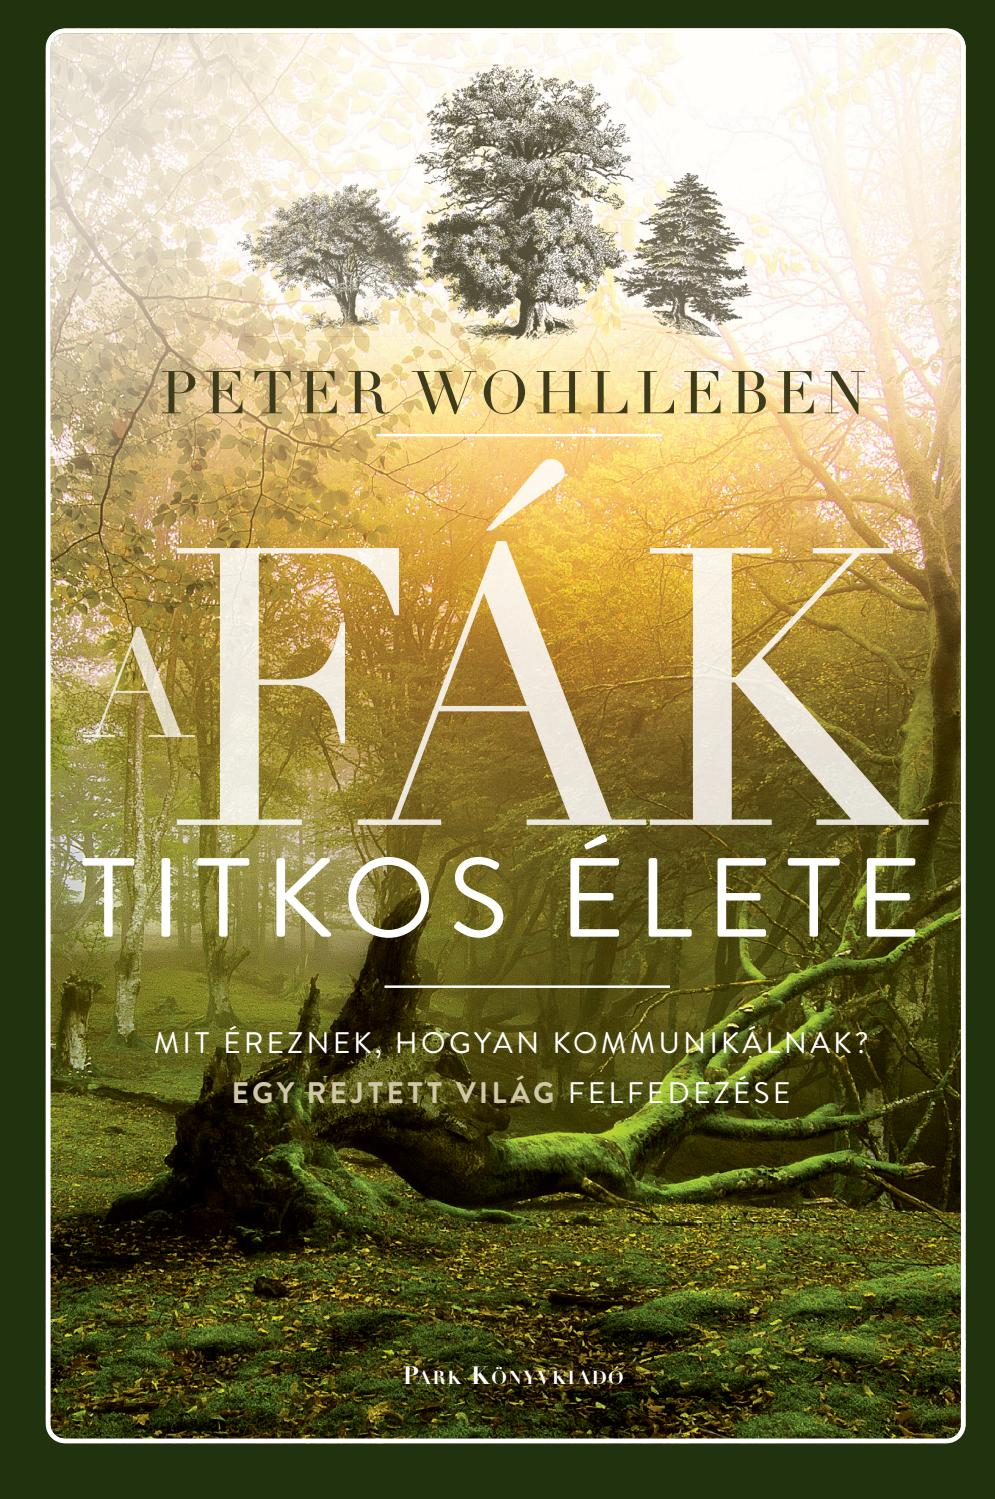 peter_wohlleben_a_fak_titkos_elete_borito.jpg